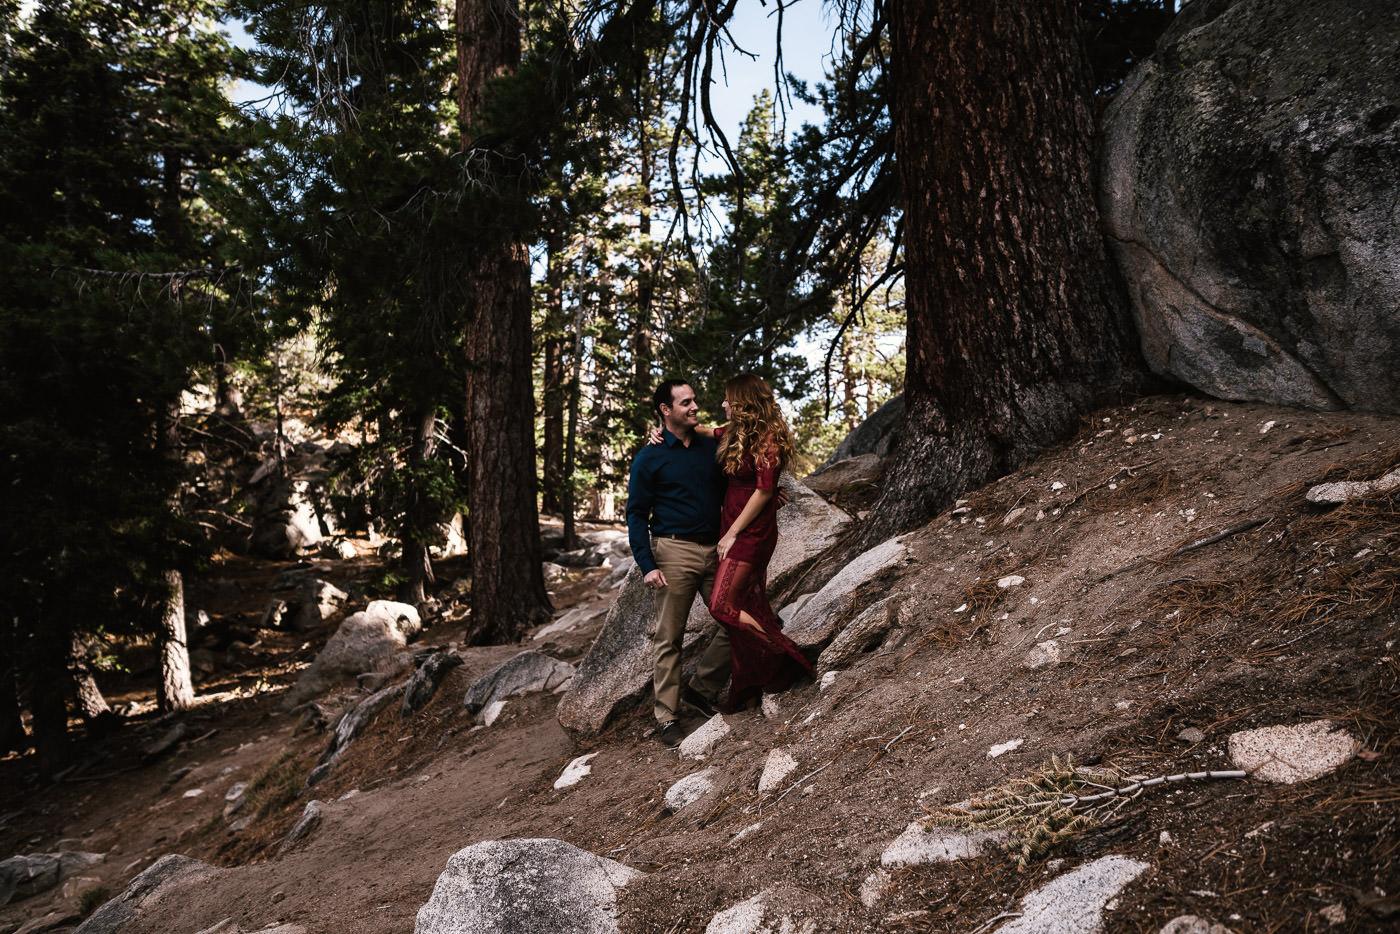 Couple gets close for a romantic engagement session on Mt. San Jacinto.